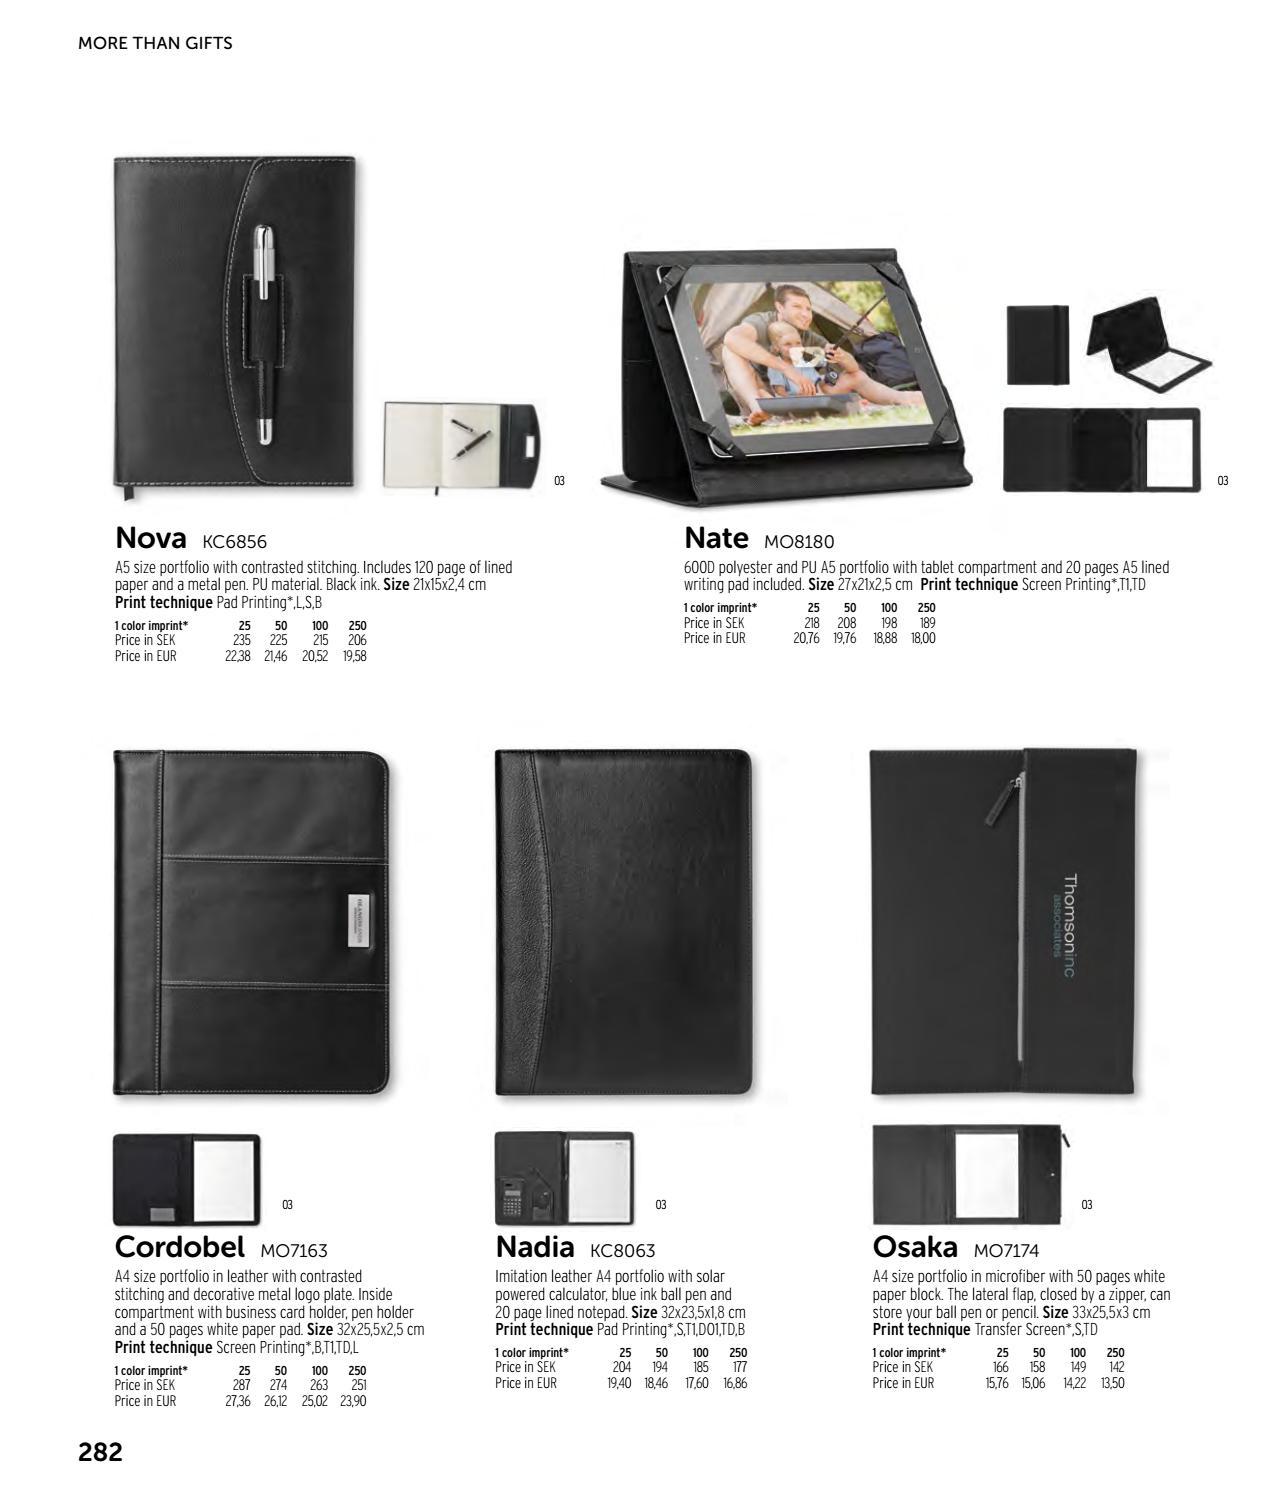 8100d7c0ceb015 Reklamegave katalog 2019 - Gifts by Detailreklame A/S - issuu